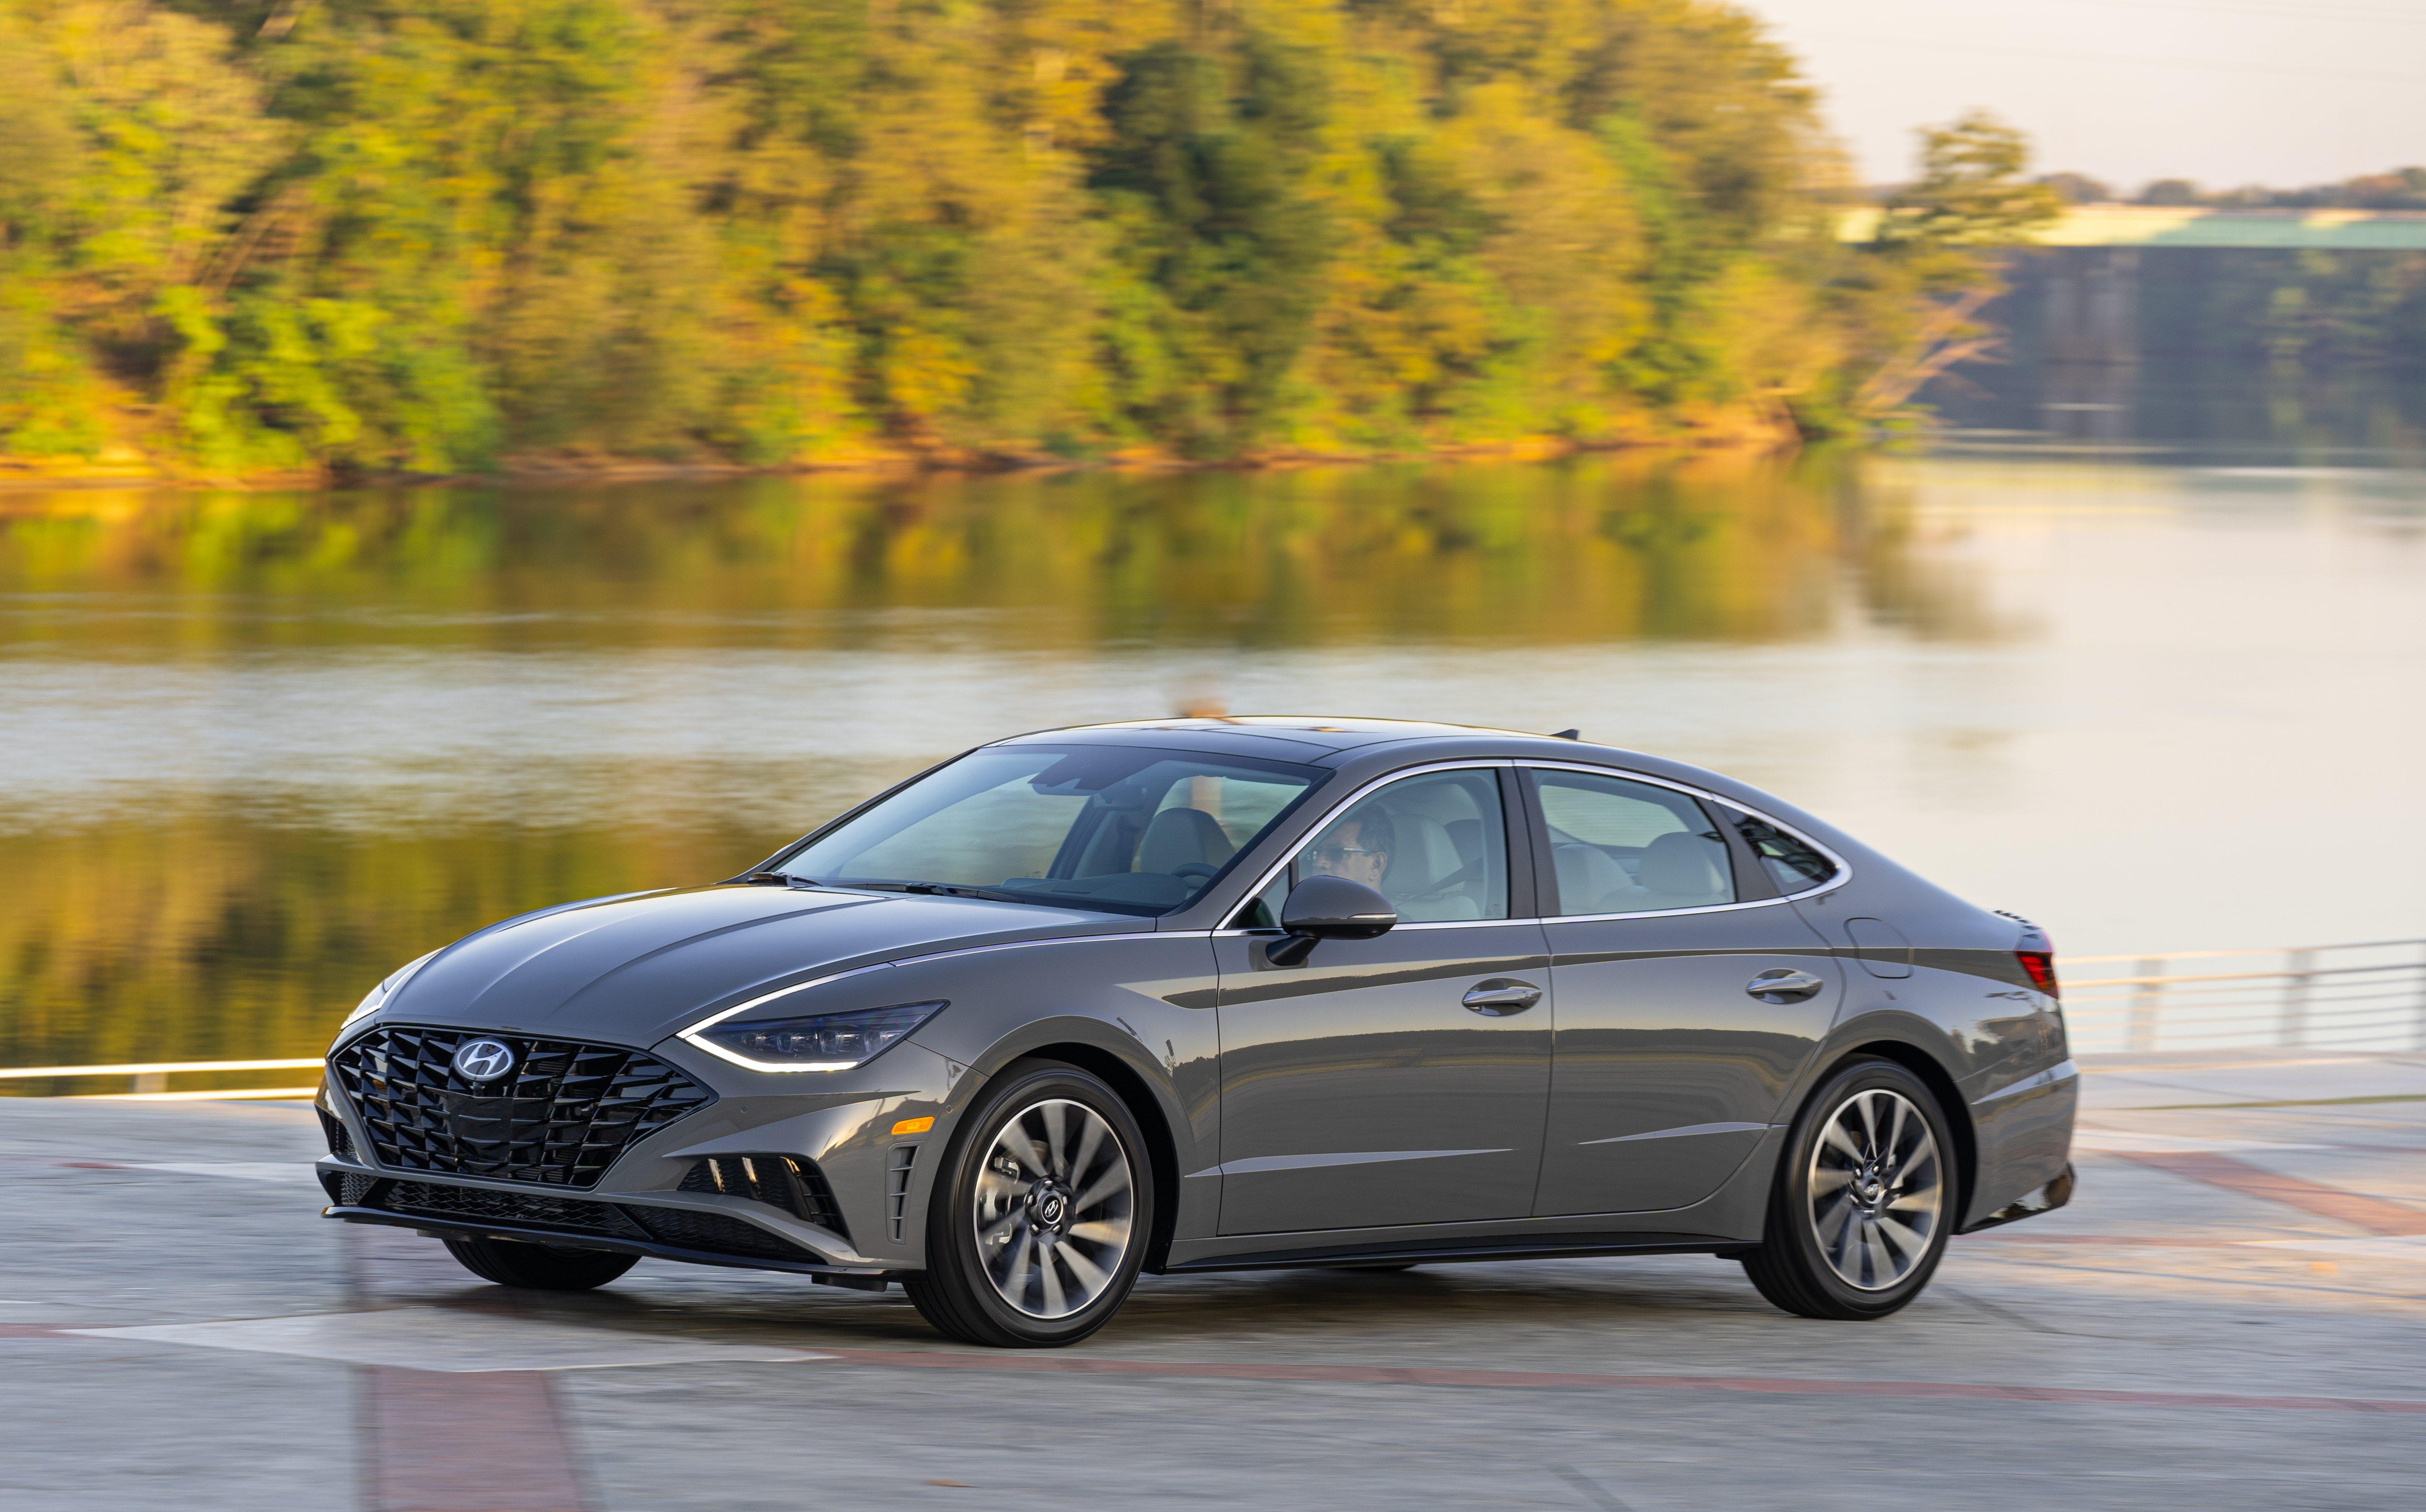 International Auto Show 2020.2020 Hyundai Sonata And Beyond 49th Annual Miami Auto Show